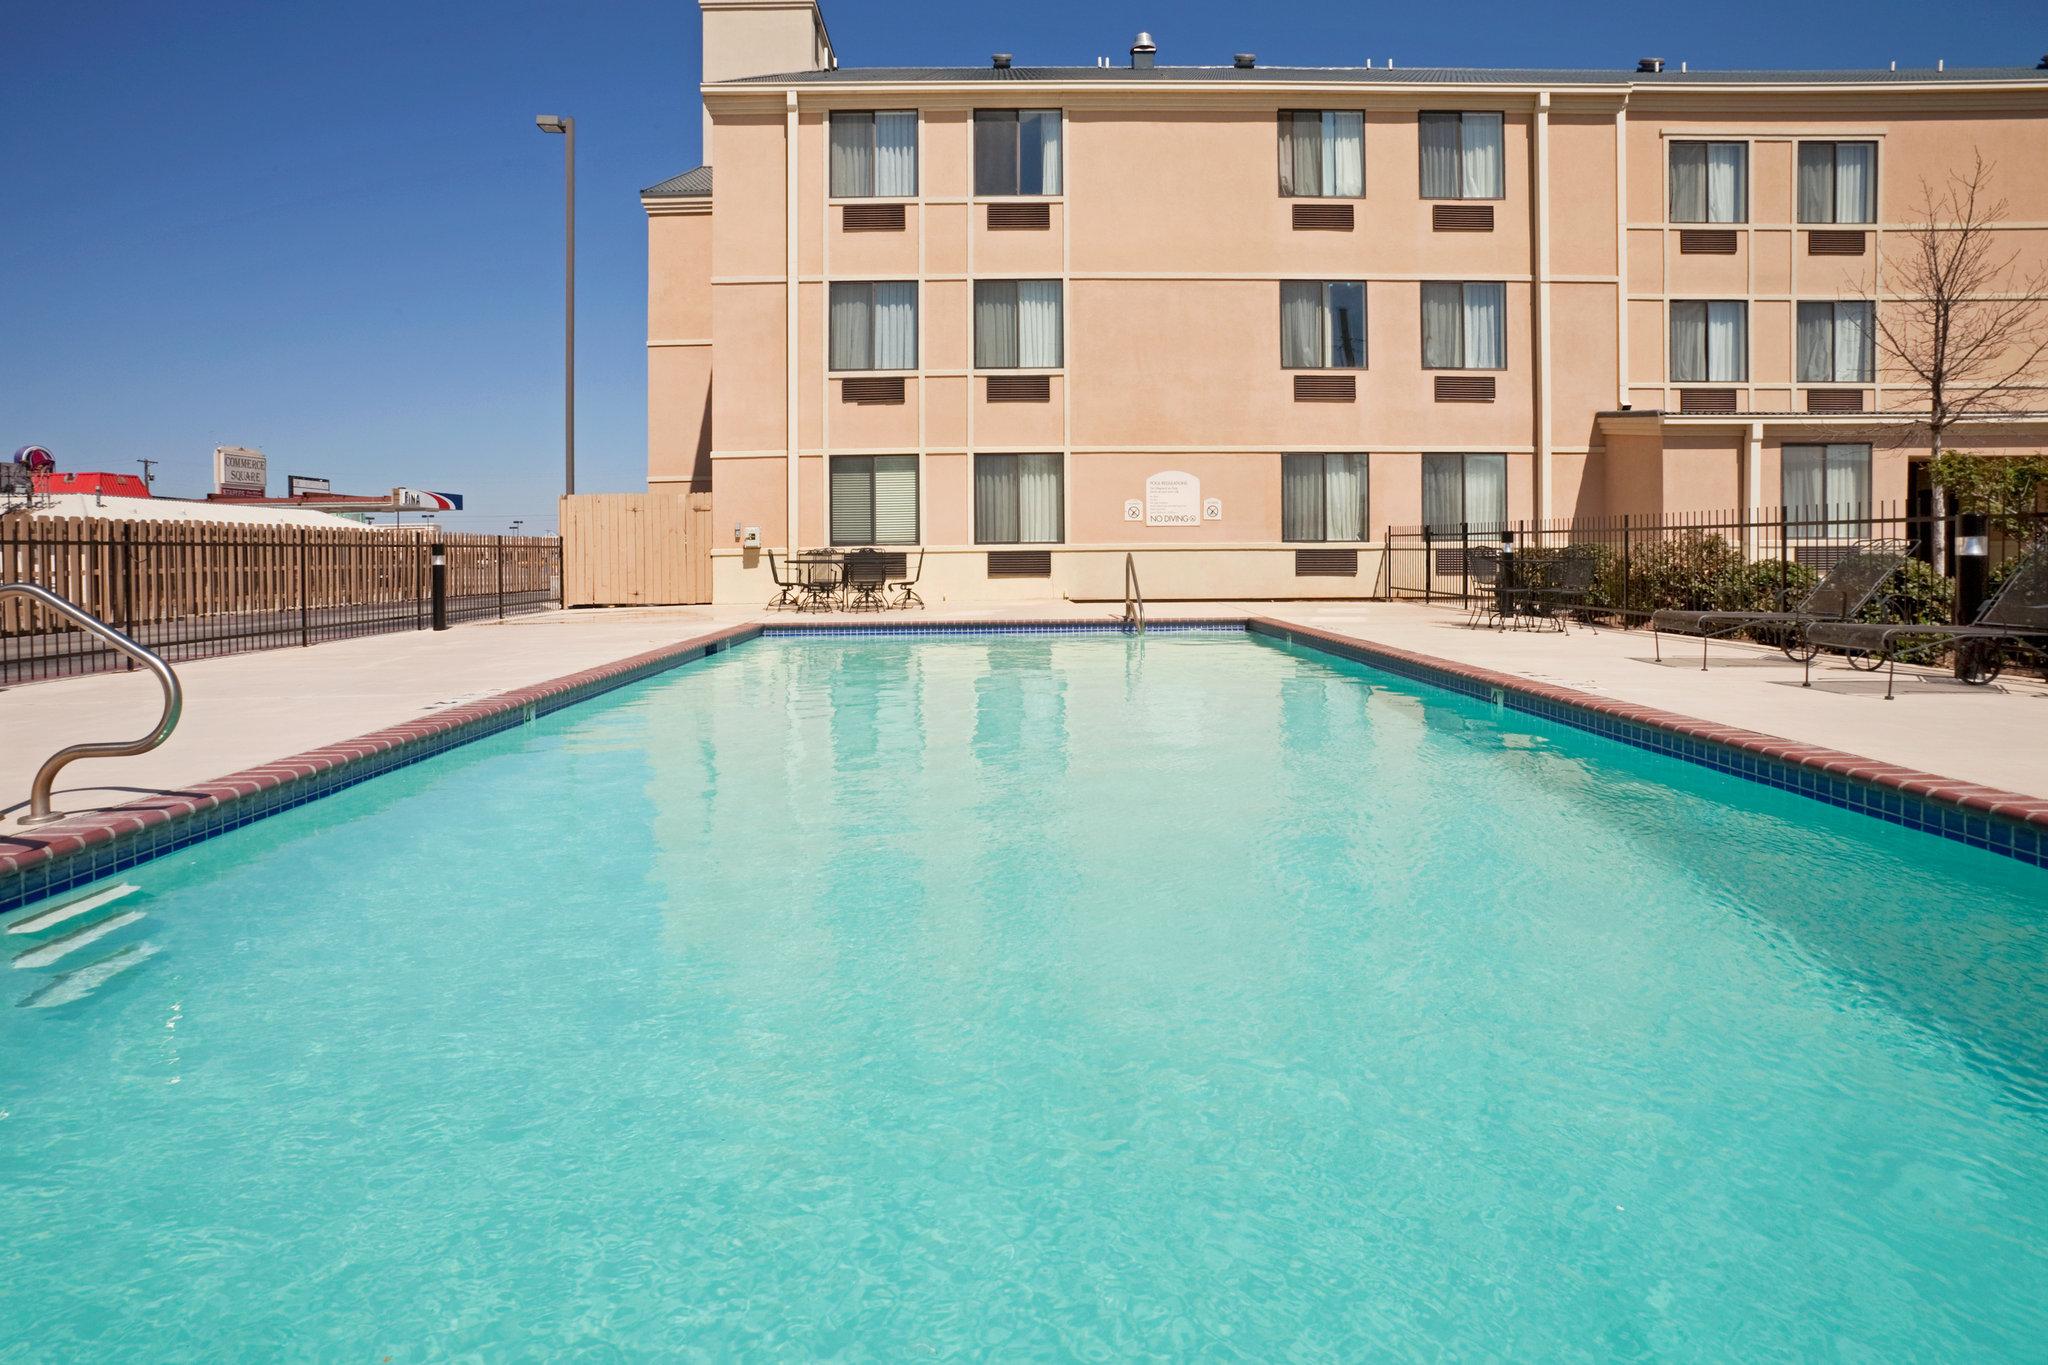 Holiday Inn Express Hotel & Suites BROWNWOOD